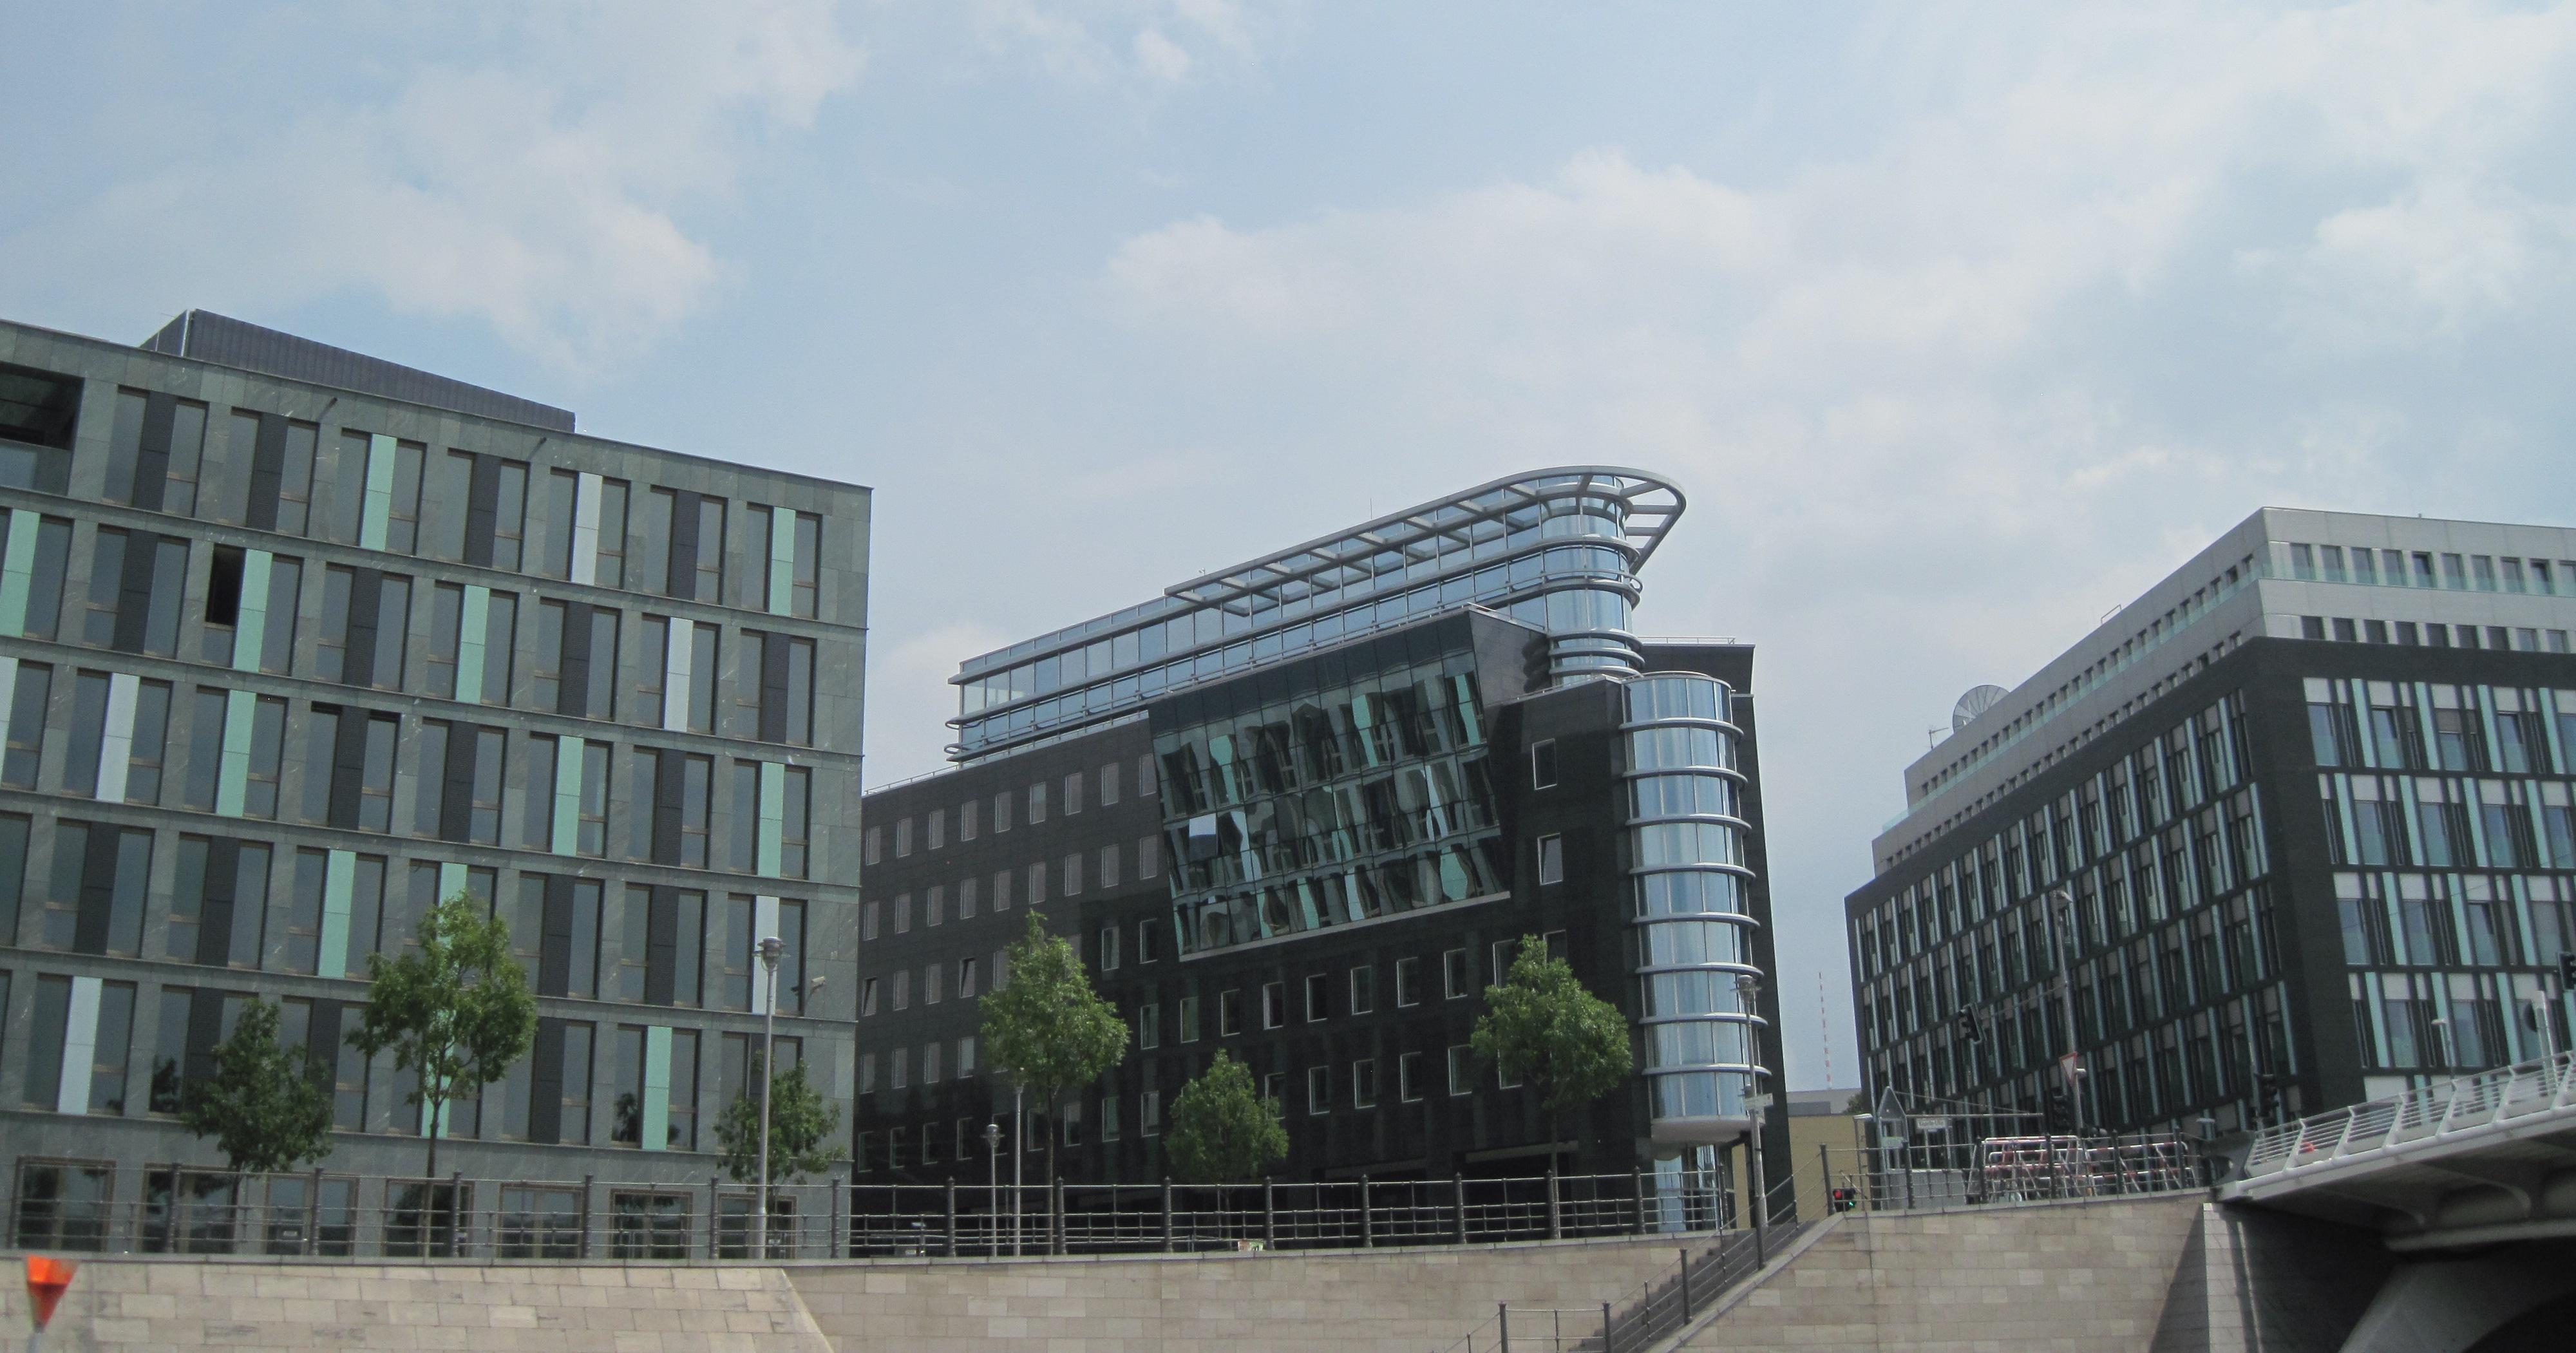 Berlin Germany 498.jpg